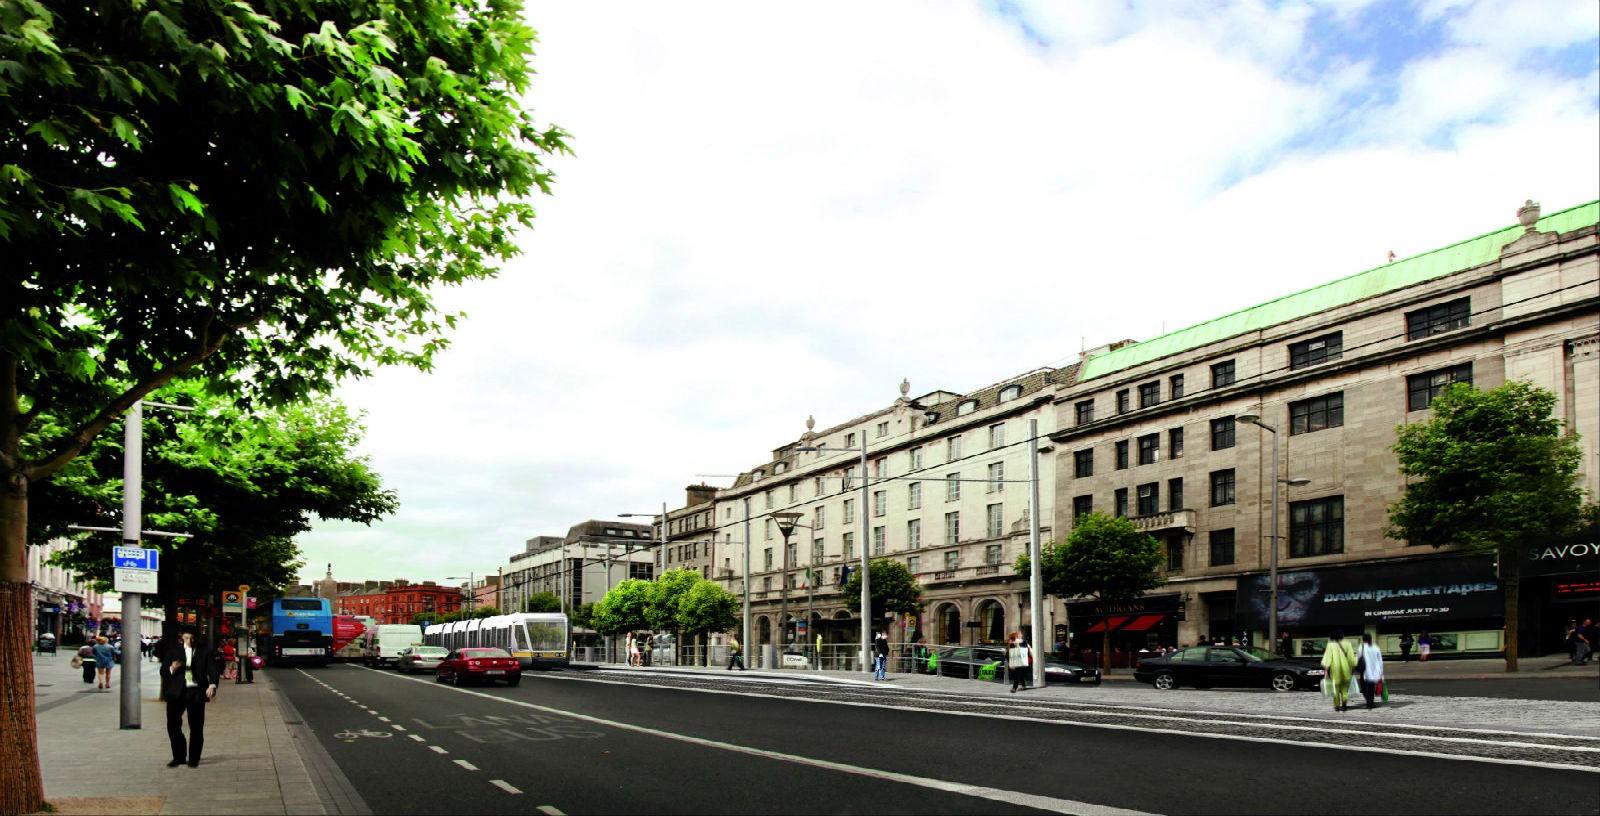 LUAS_TRAM_IN_DUBLIN_02_Architecture_IDOM_Copyright